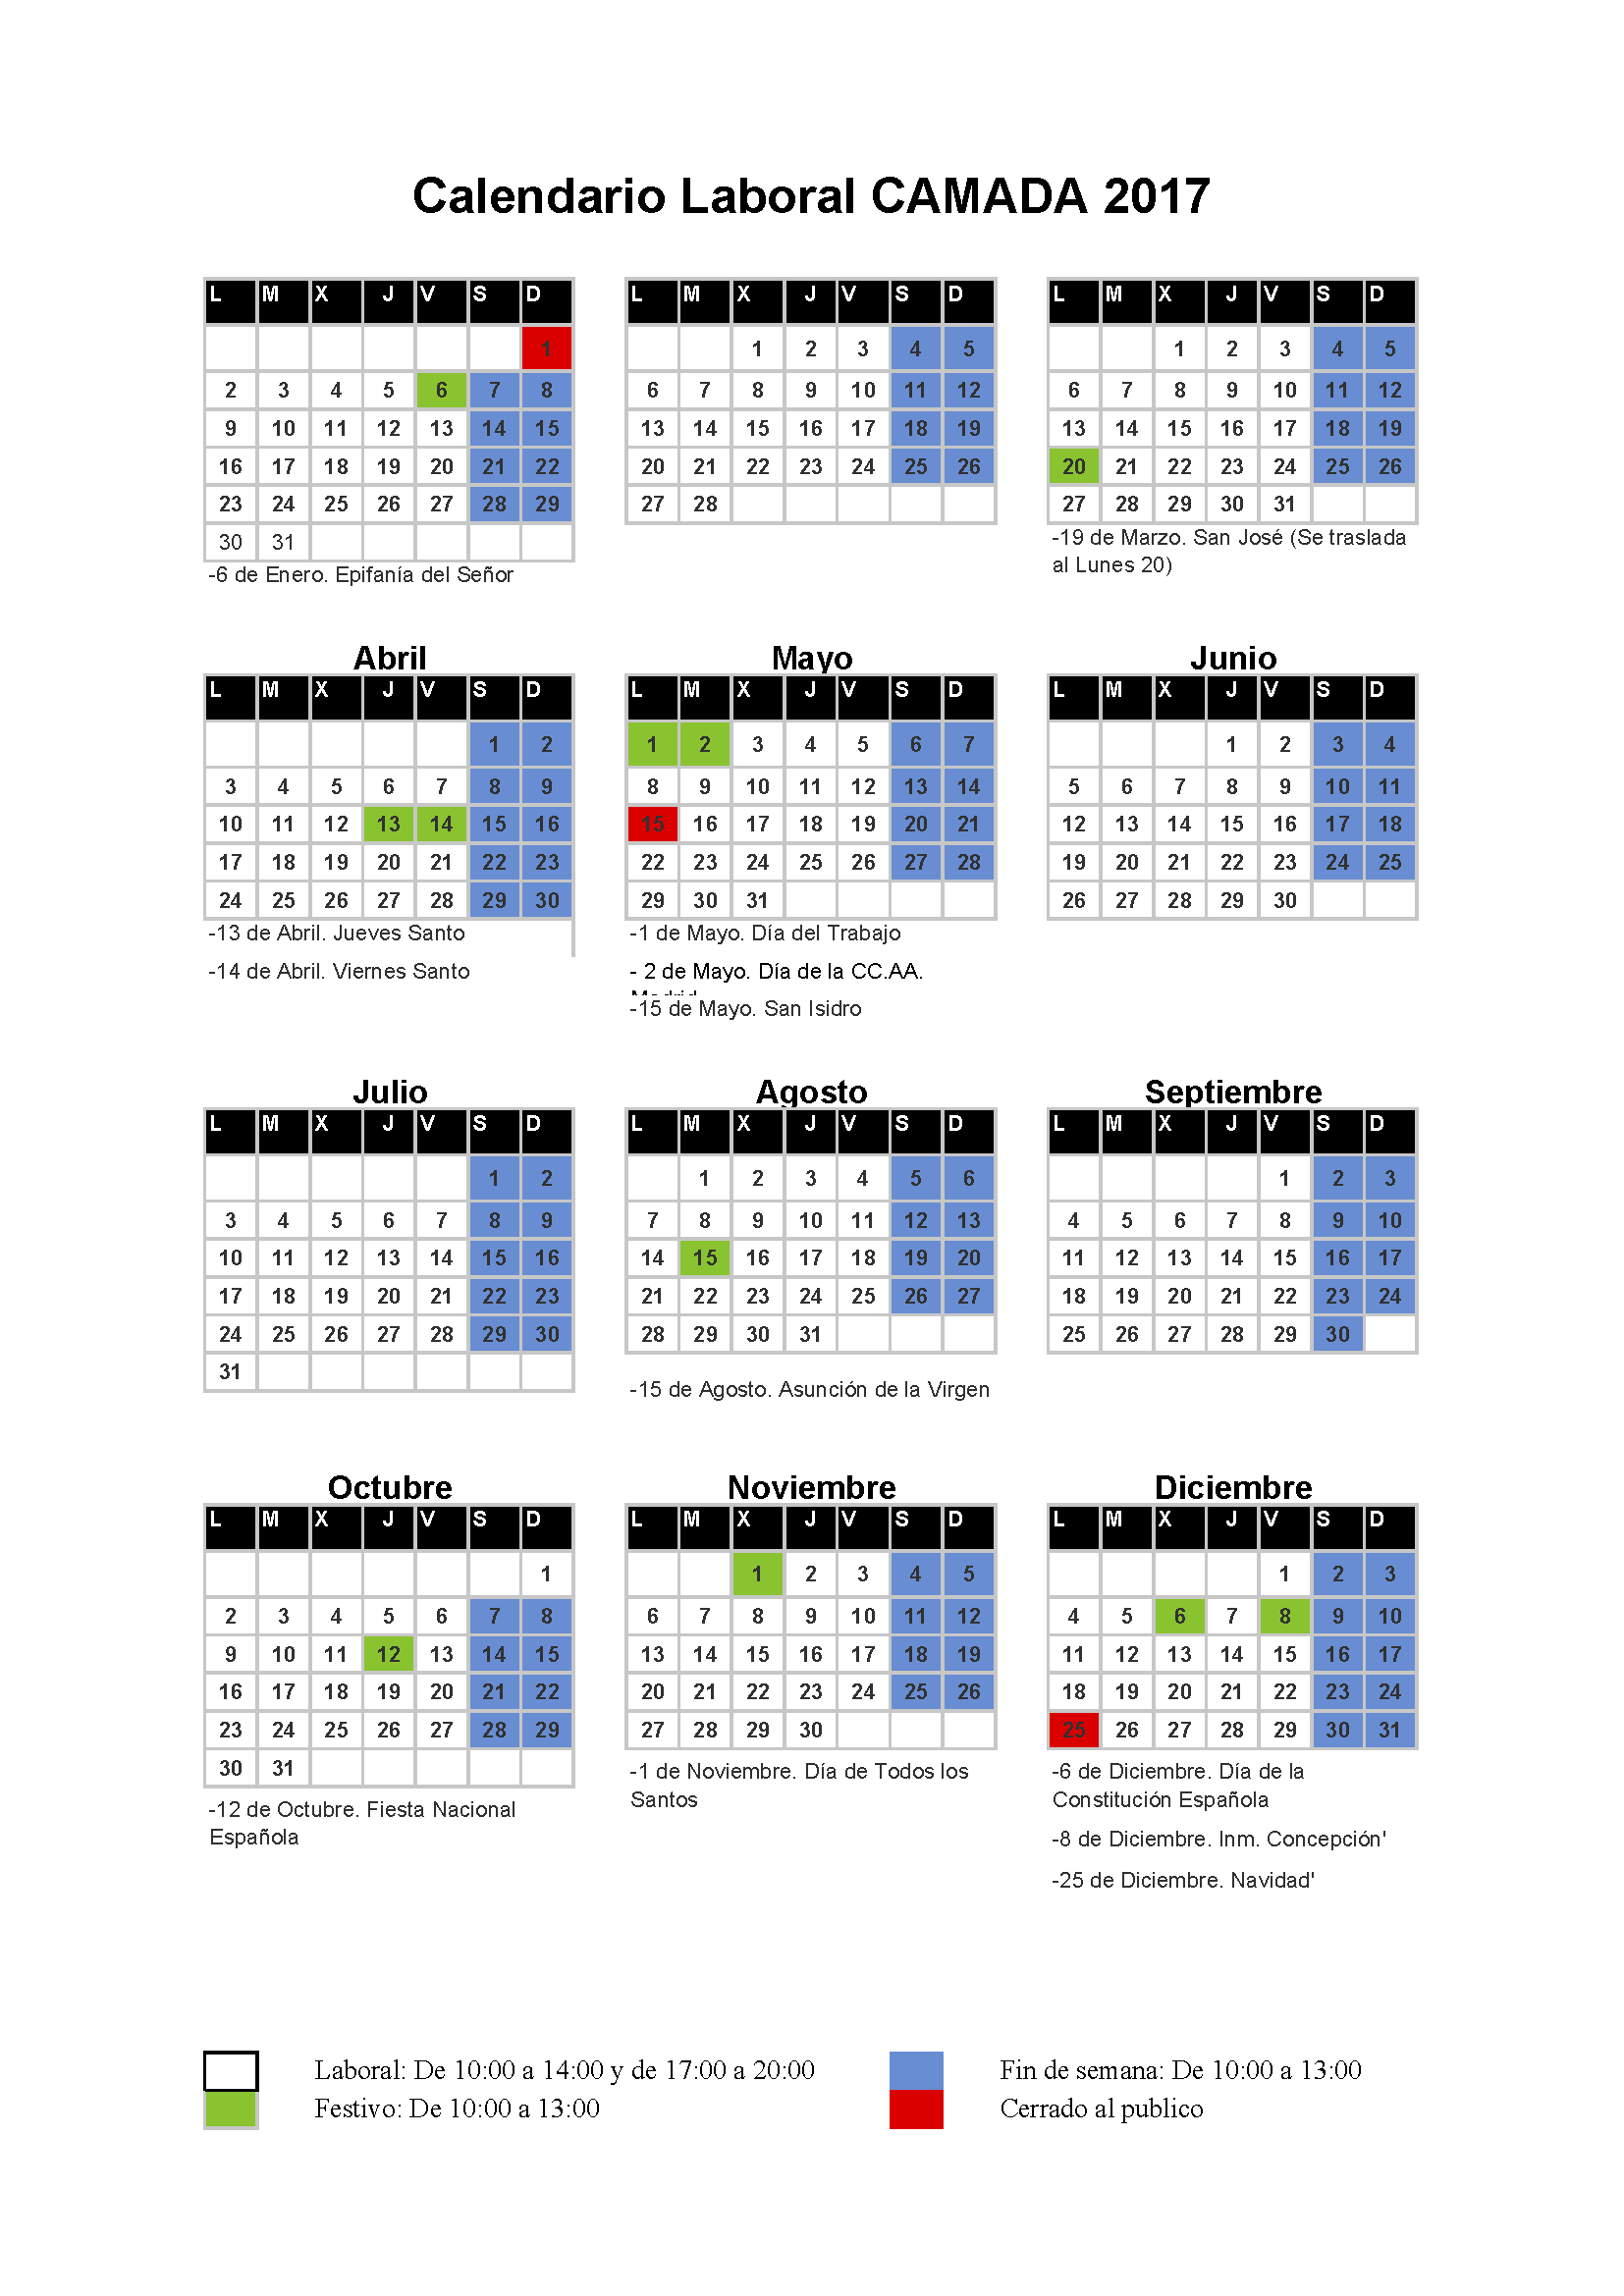 Calendario laboral Camada 2017